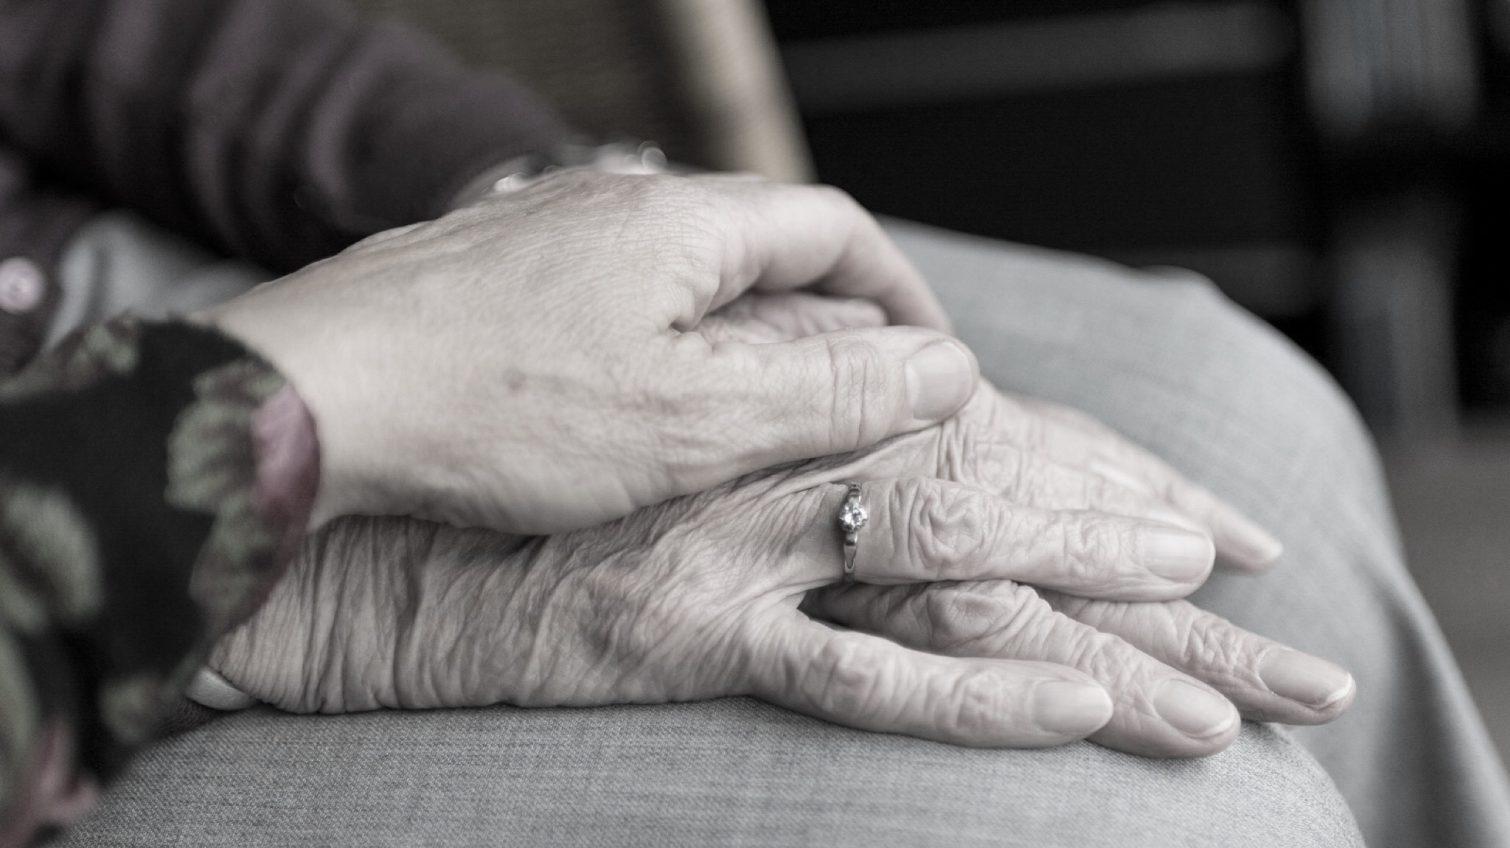 За «спасение» сына пенсионеры отдали «следователю полиции» 100 тысяч гривен (фото, видео) «фото»